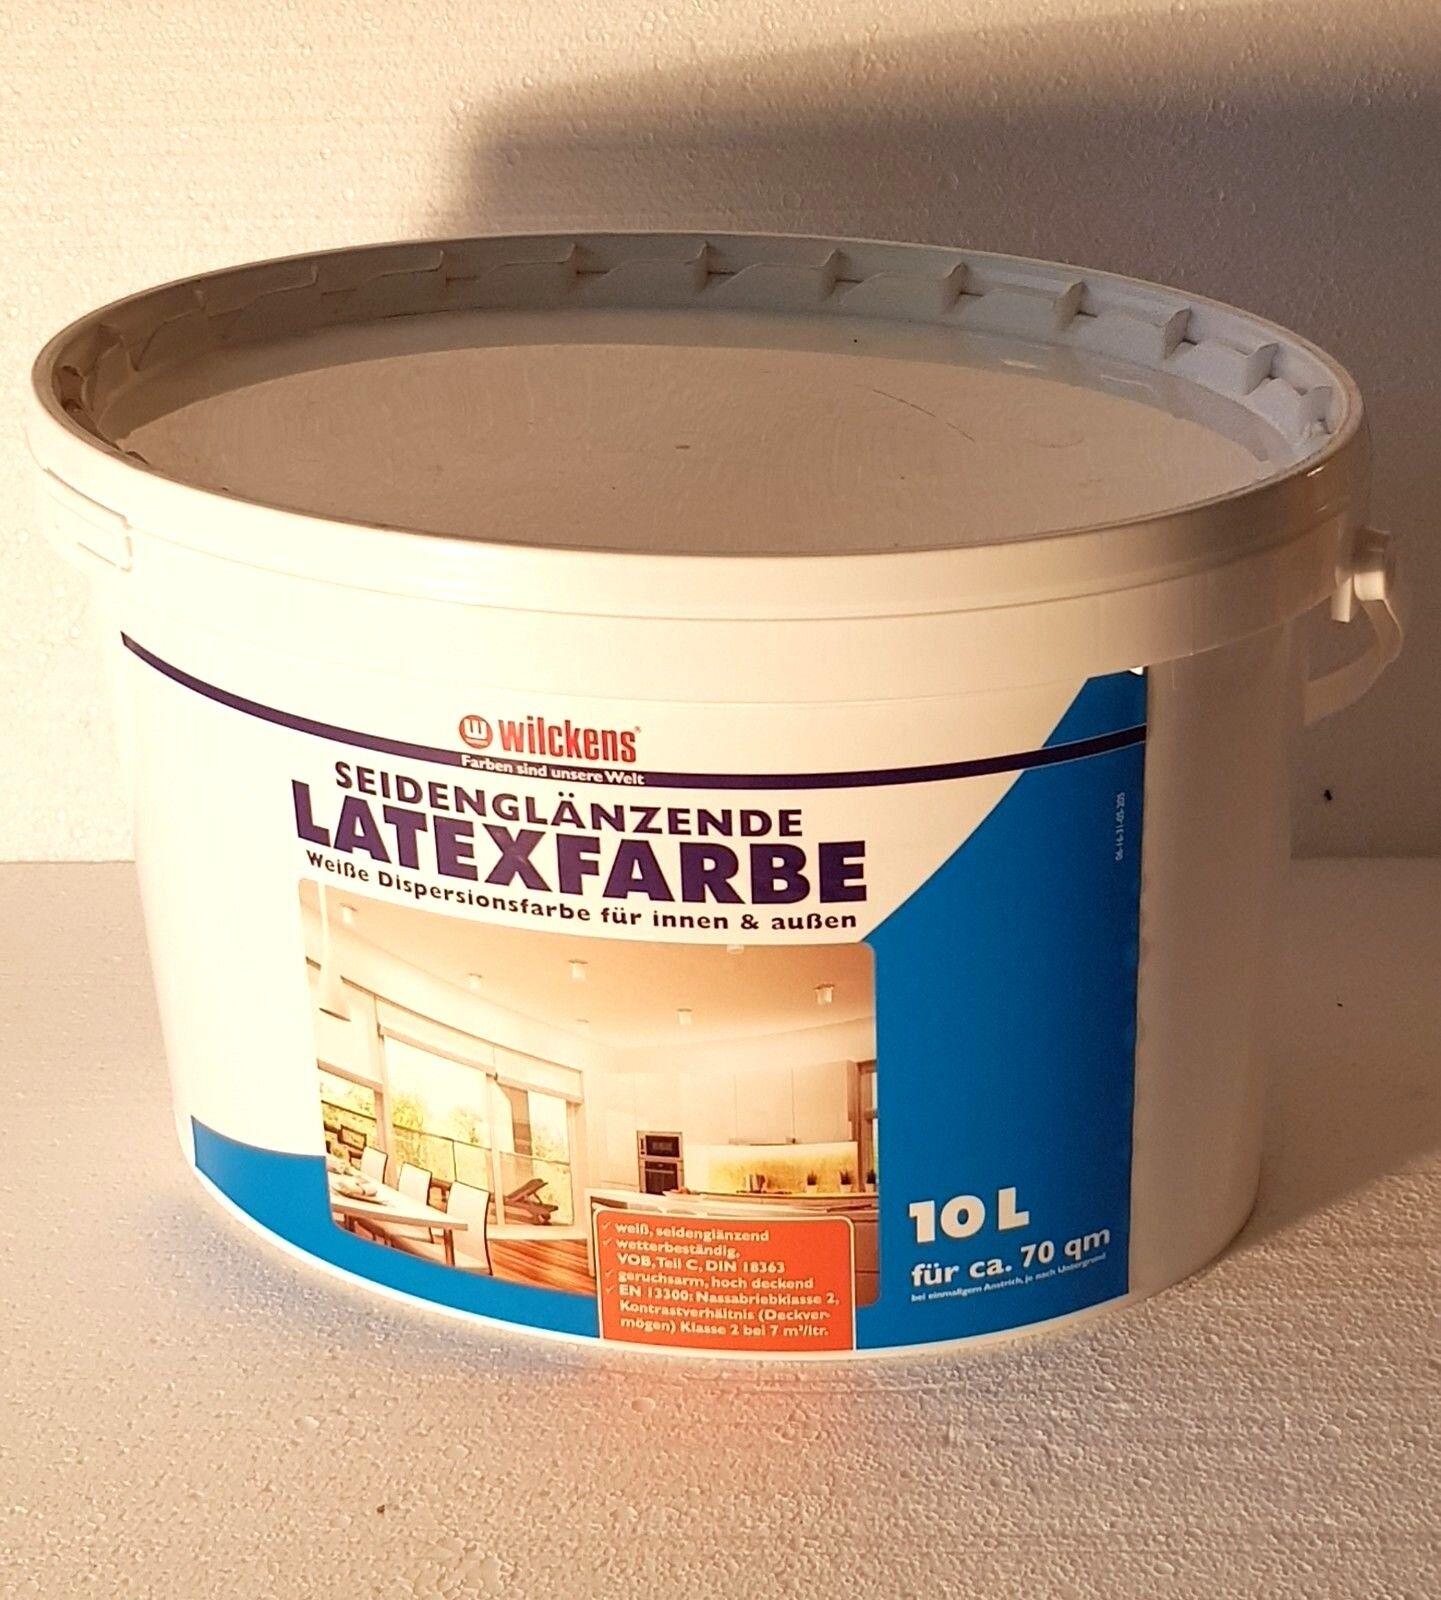 Купить wilckens latexfarbe seidenglanz abwaschbar dispersionsfarbe